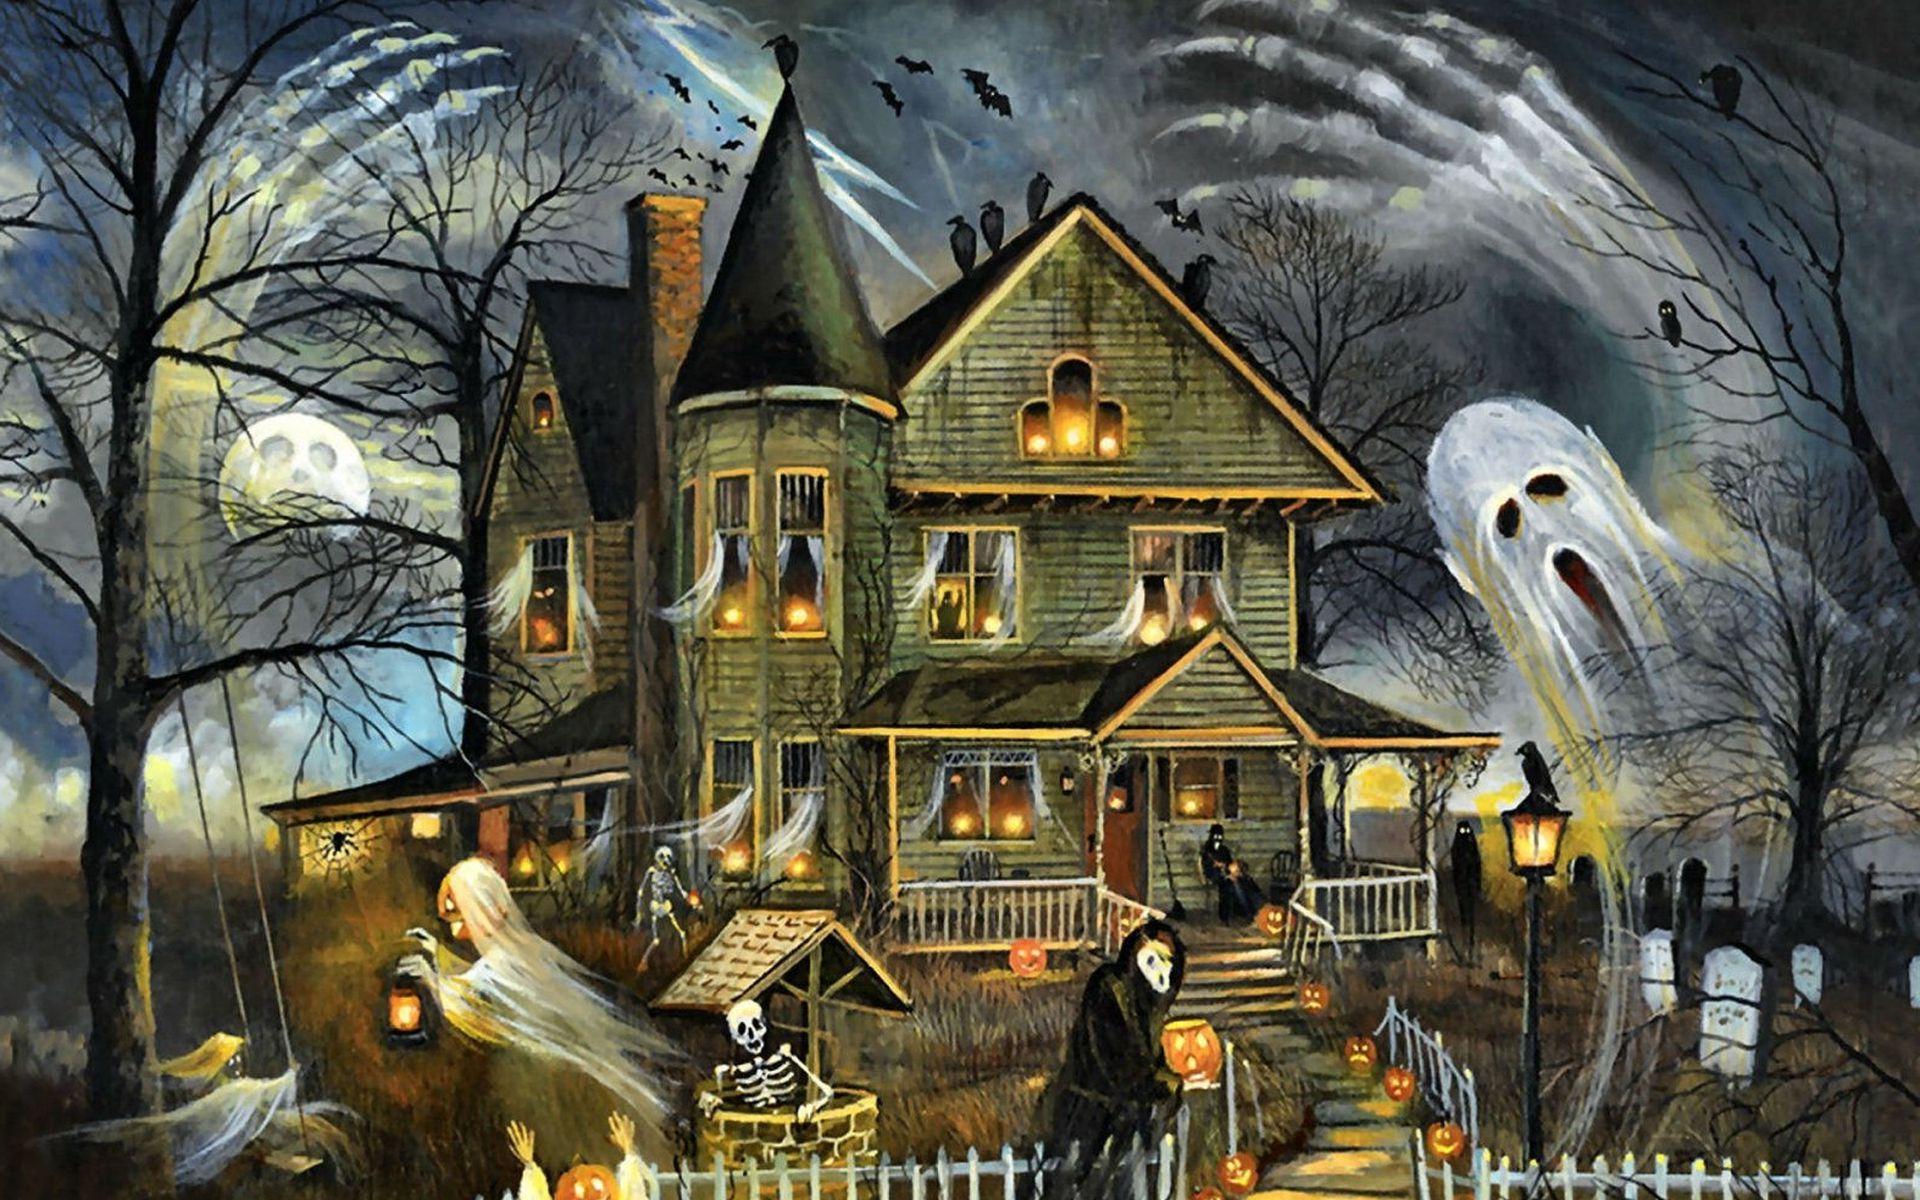 Призраки у старого дома в хэллоуин